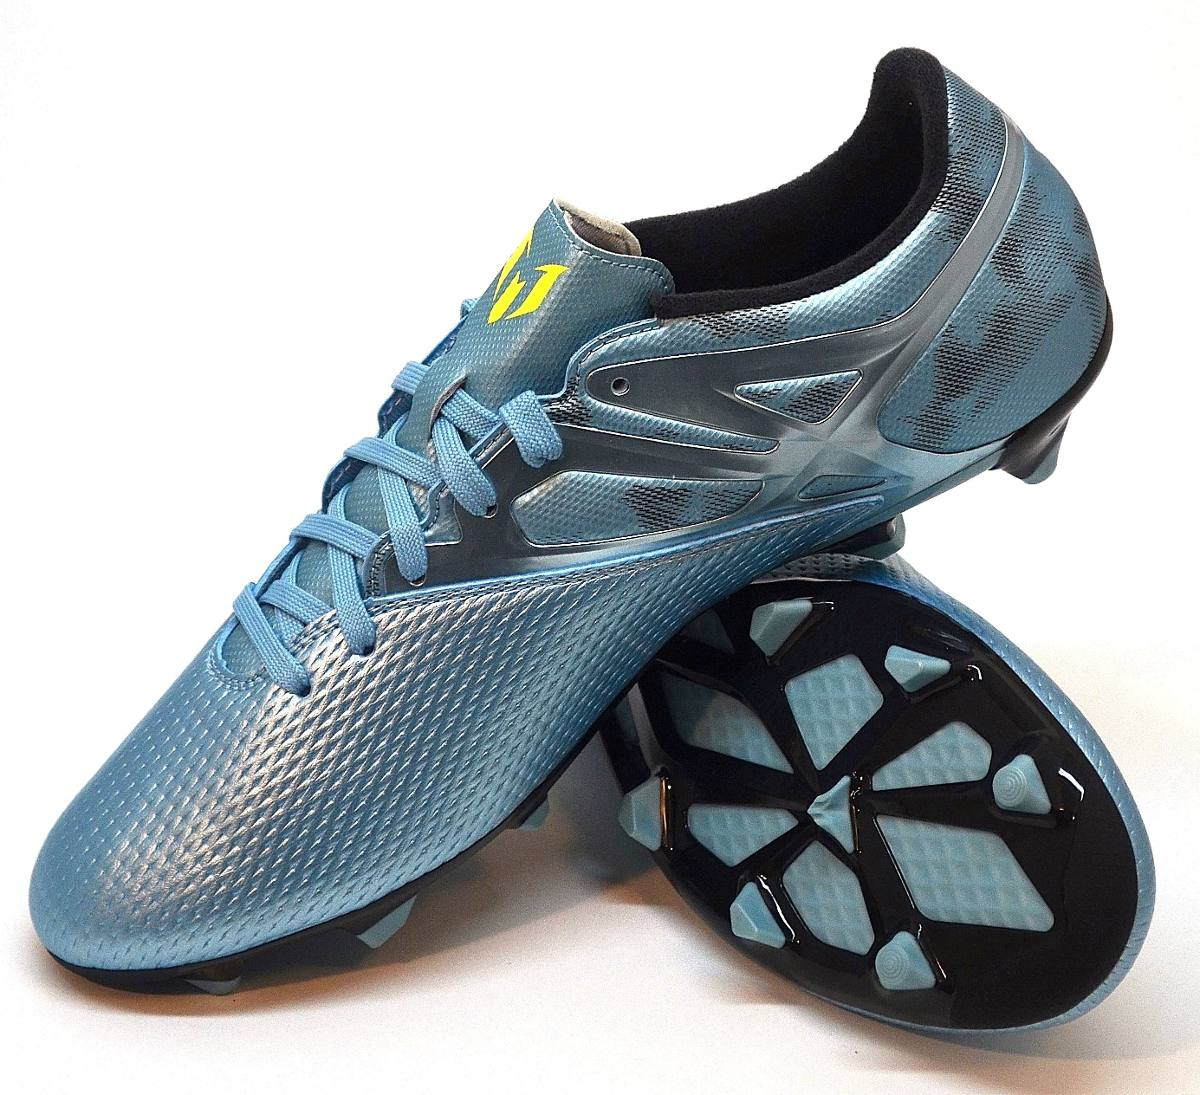 b410500e Adidas Botines Messi 2015 botasdefutbolbaratasoutlet.es